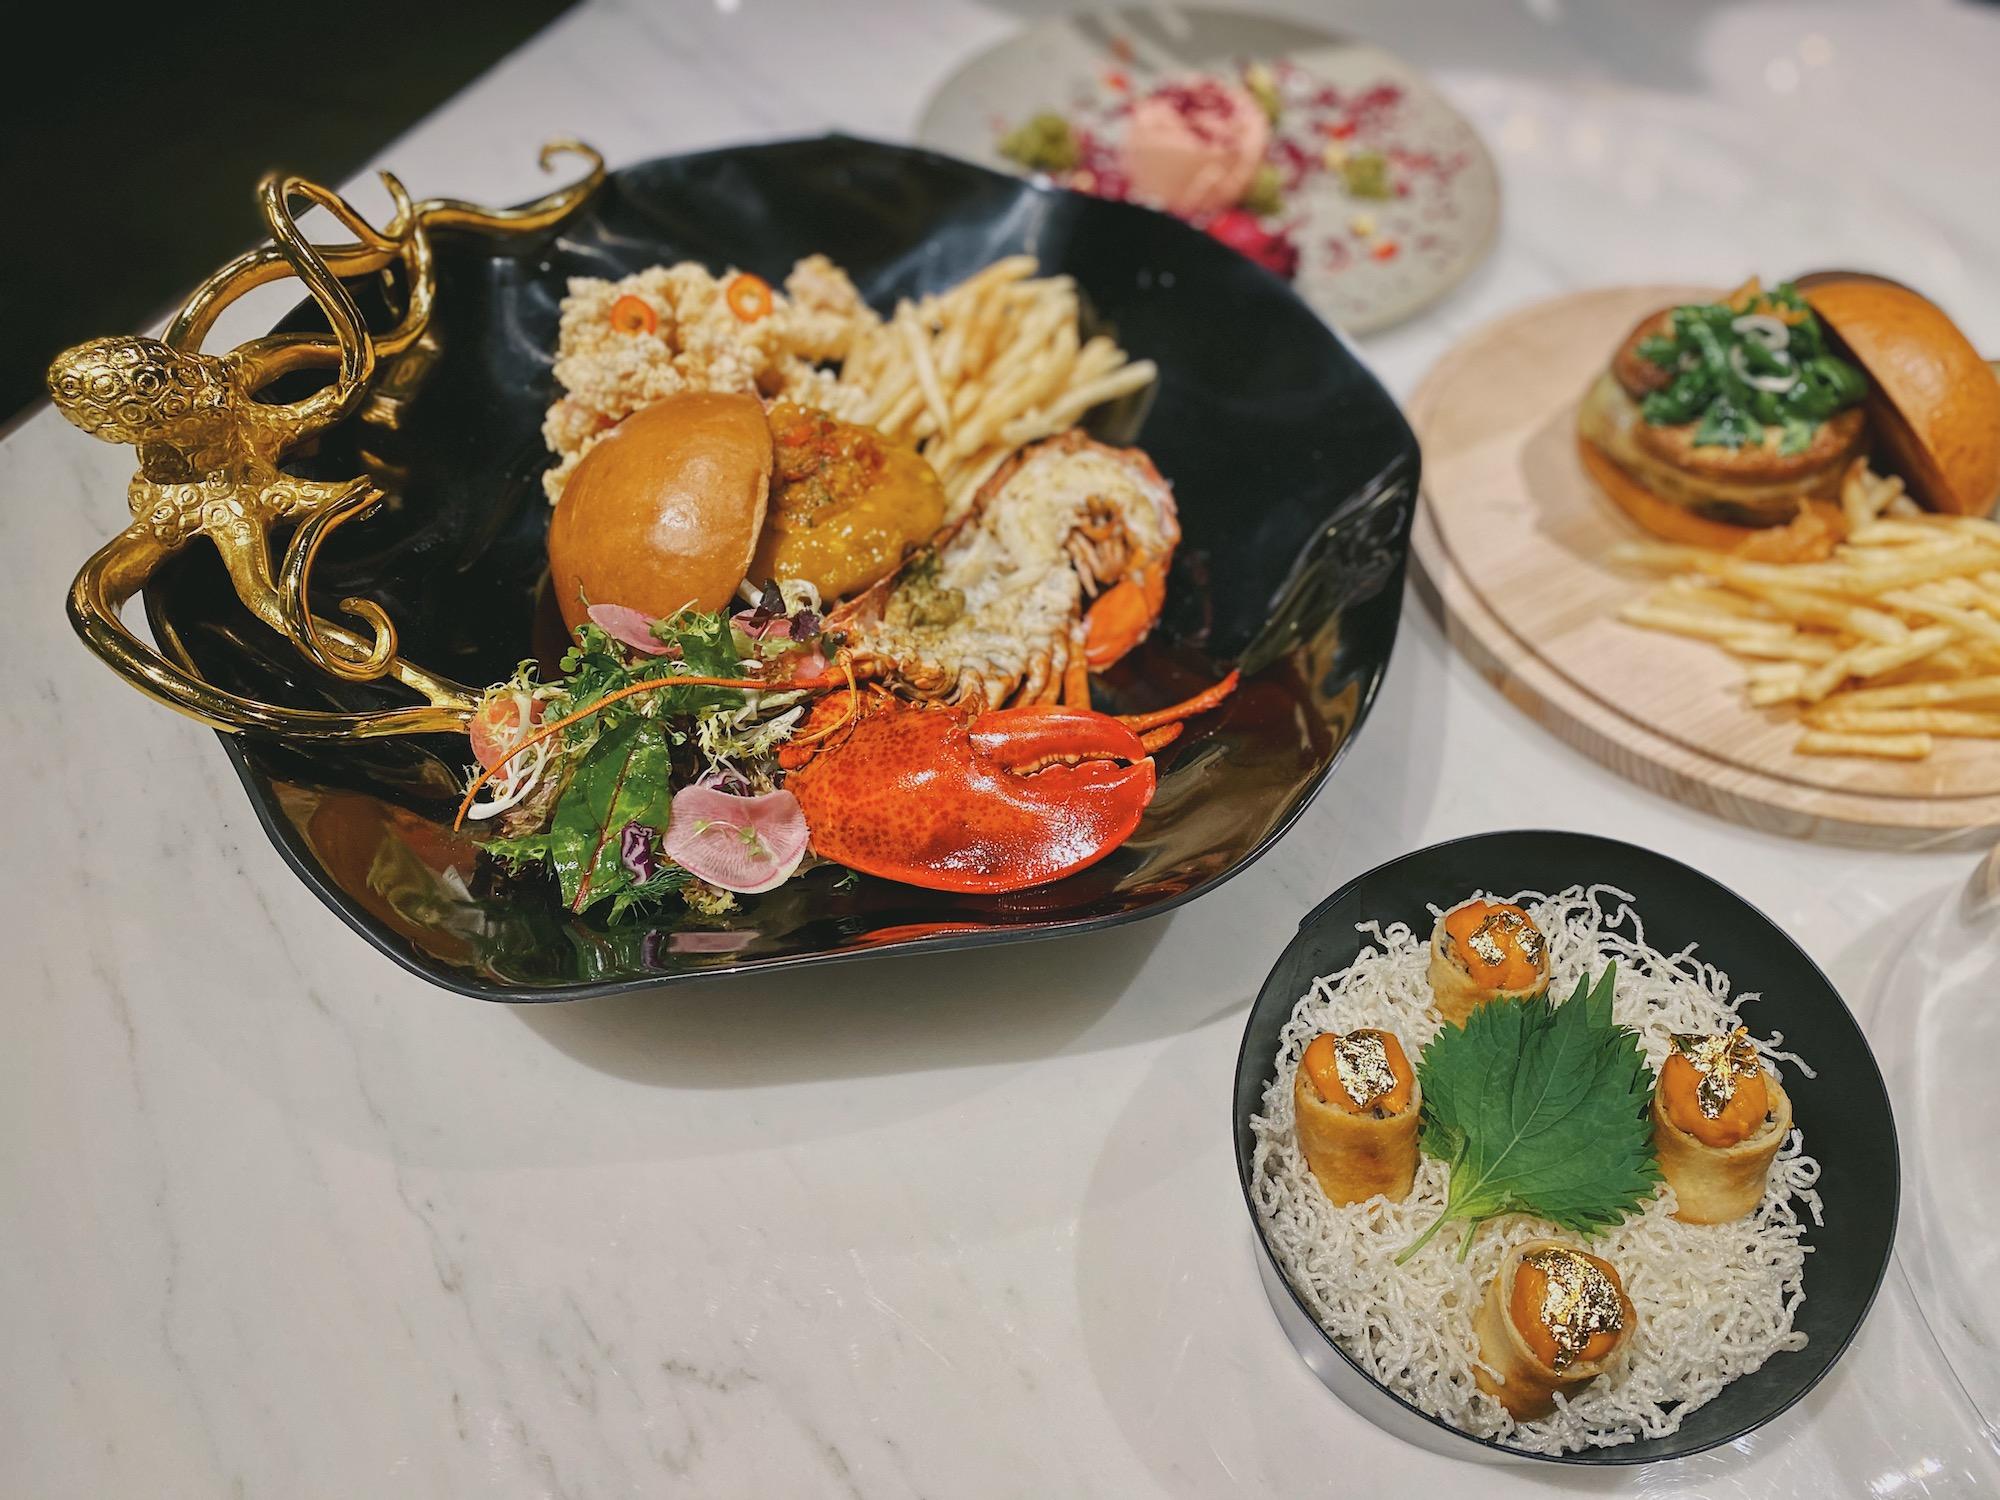 the-st-regis-bar-macao-macau-lifestyle-platter-springrolls-chicken-burger